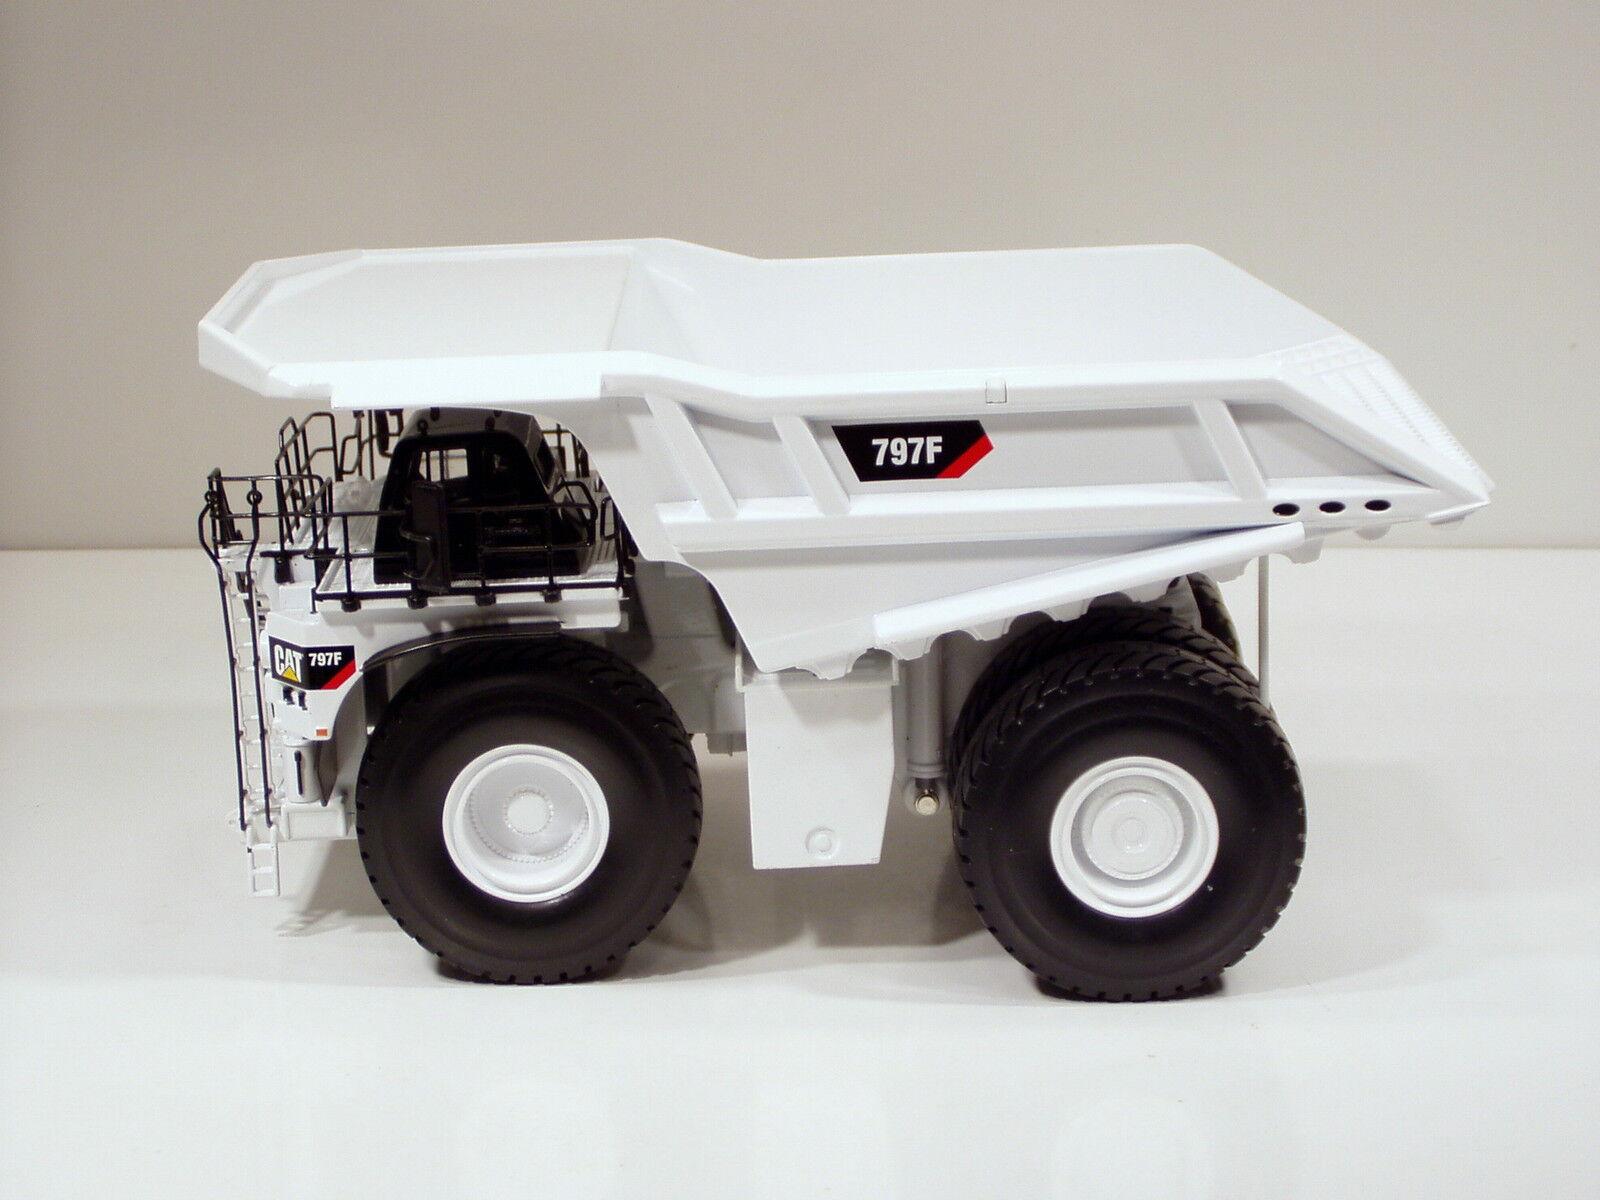 Caterpillar 797f Dump Truck - blanco - -Norscot  55243 - 2500 hecho